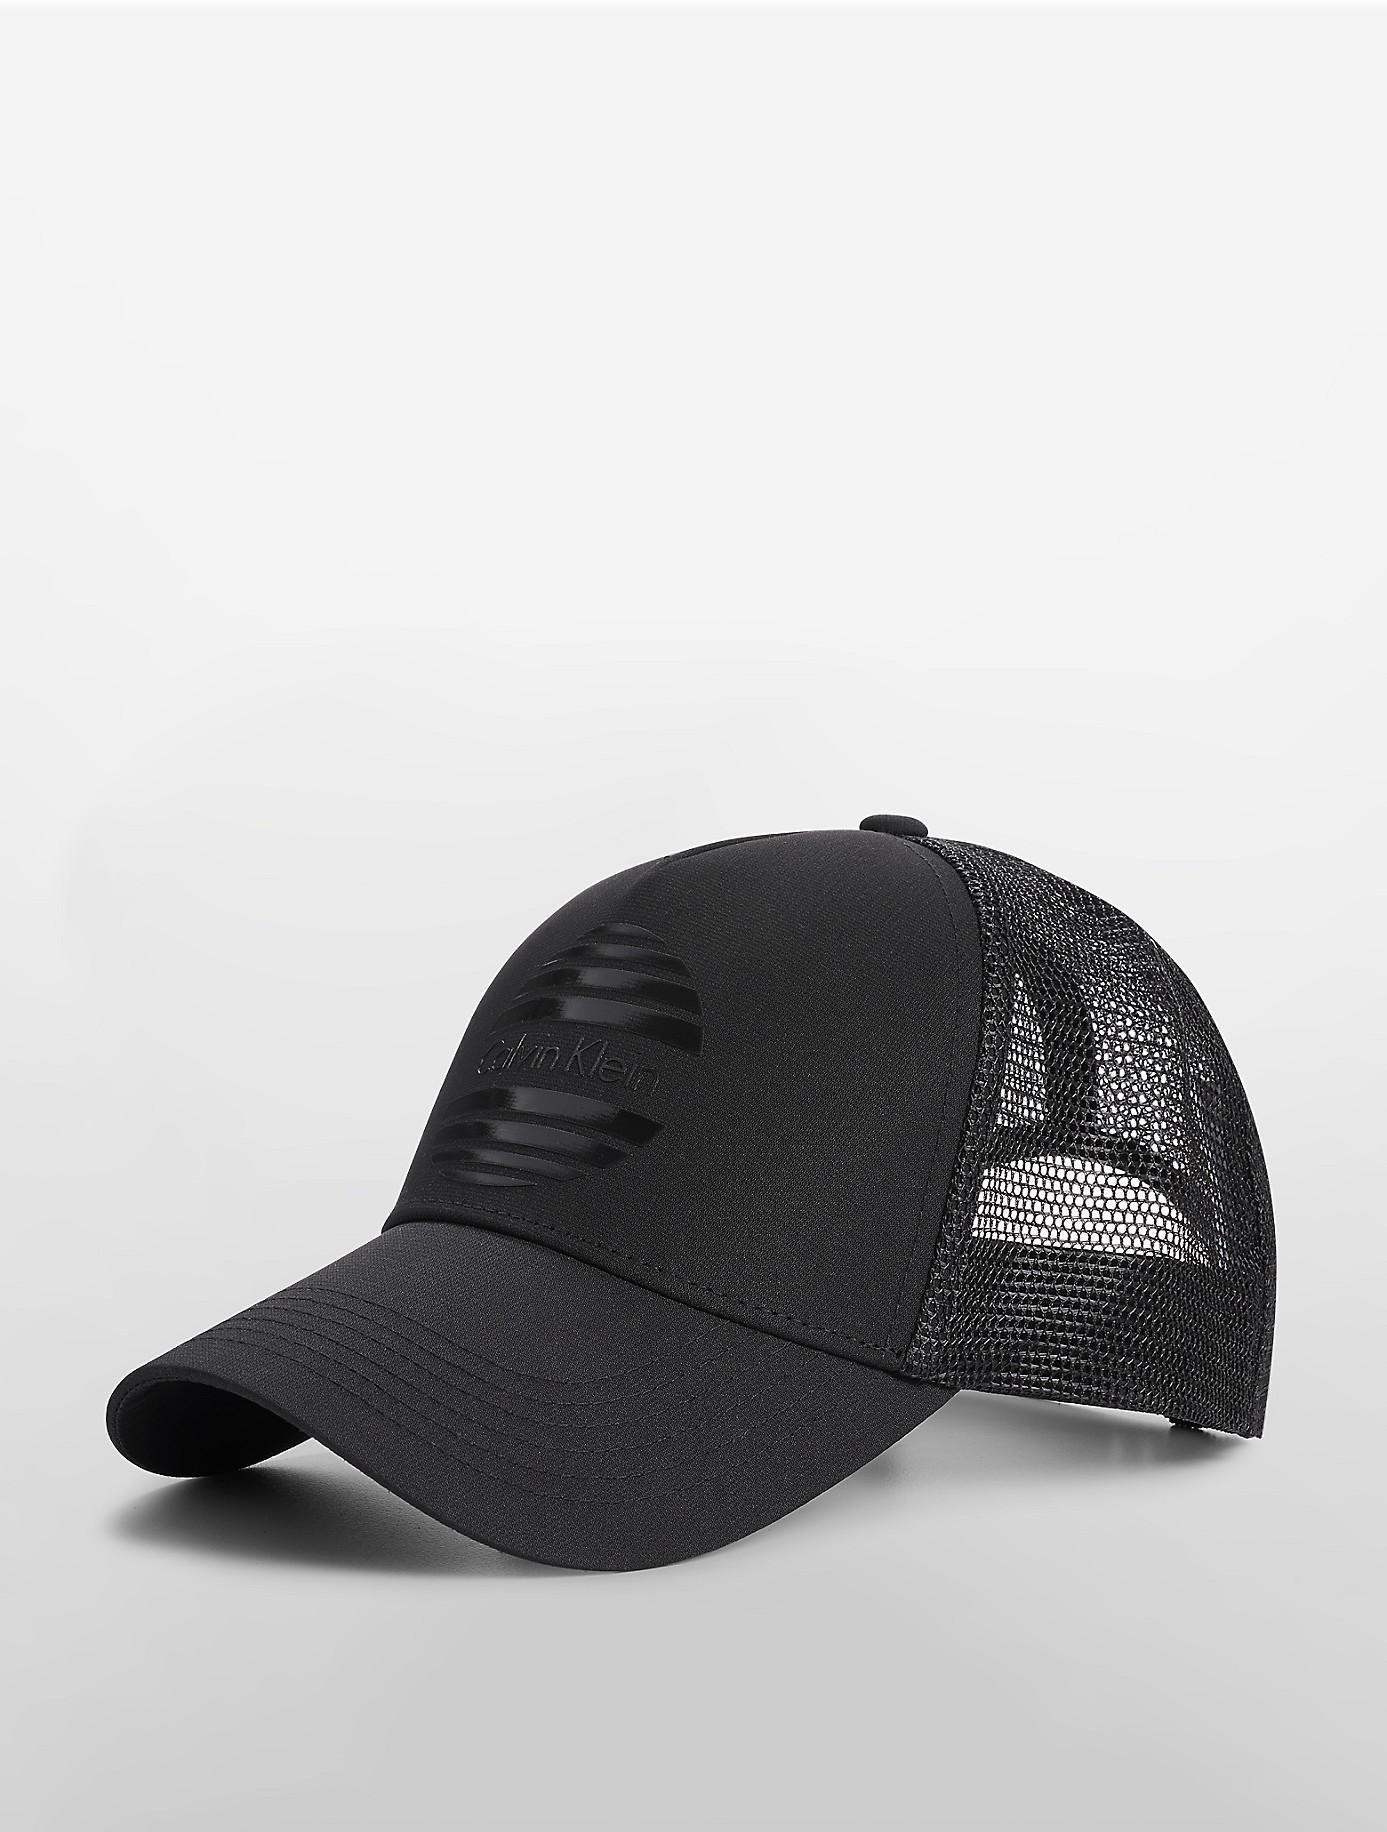 calvin klein shutter logo trucker cap in black for men lyst. Black Bedroom Furniture Sets. Home Design Ideas